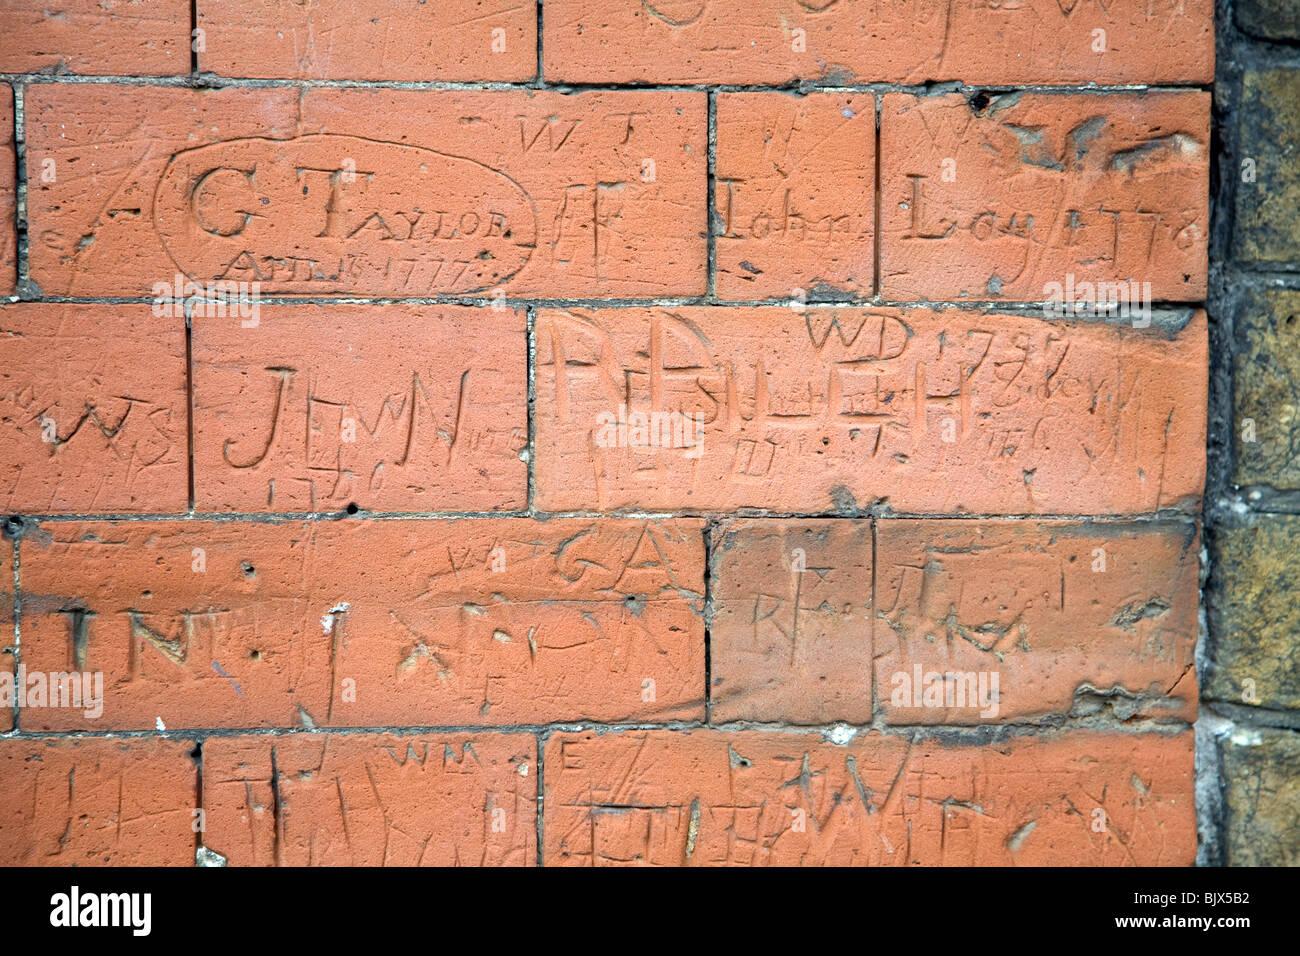 Eighteenth century graffiti scratched on brick wall of school building, Dedham, Essex - Stock Image